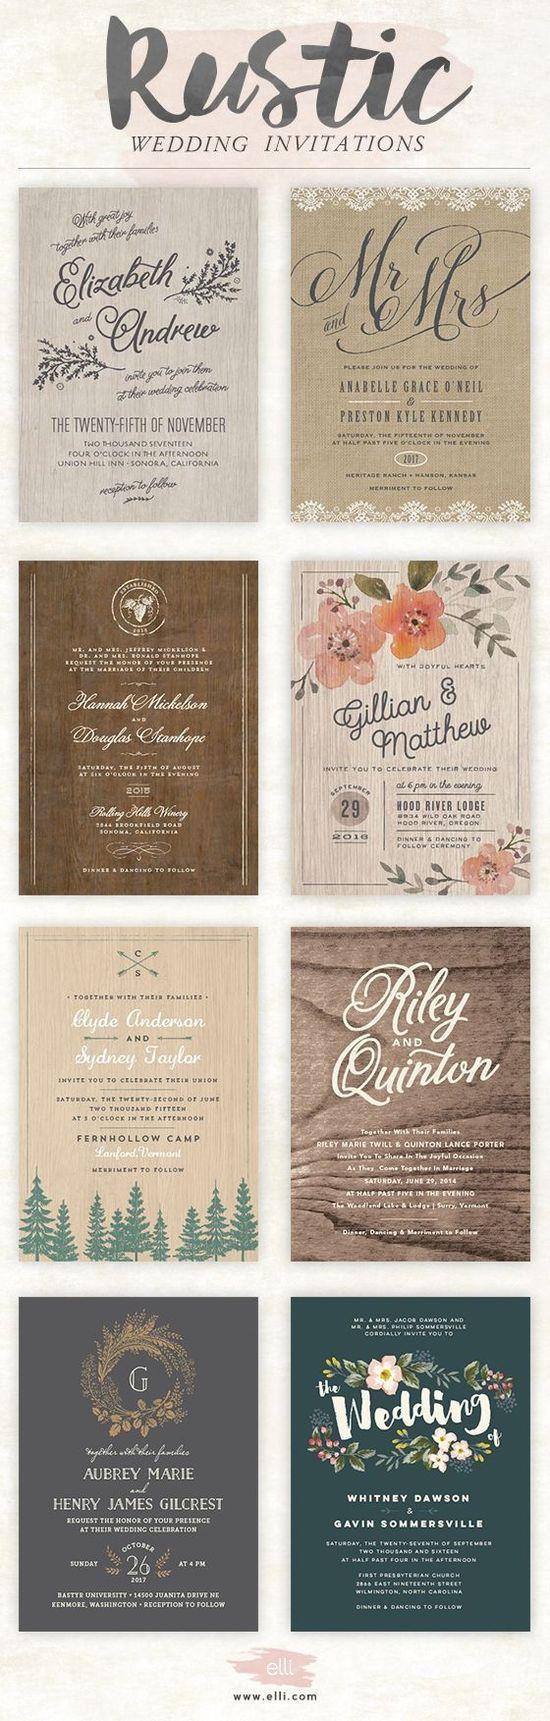 wedding invitations gifts%0A Wedding Invitations